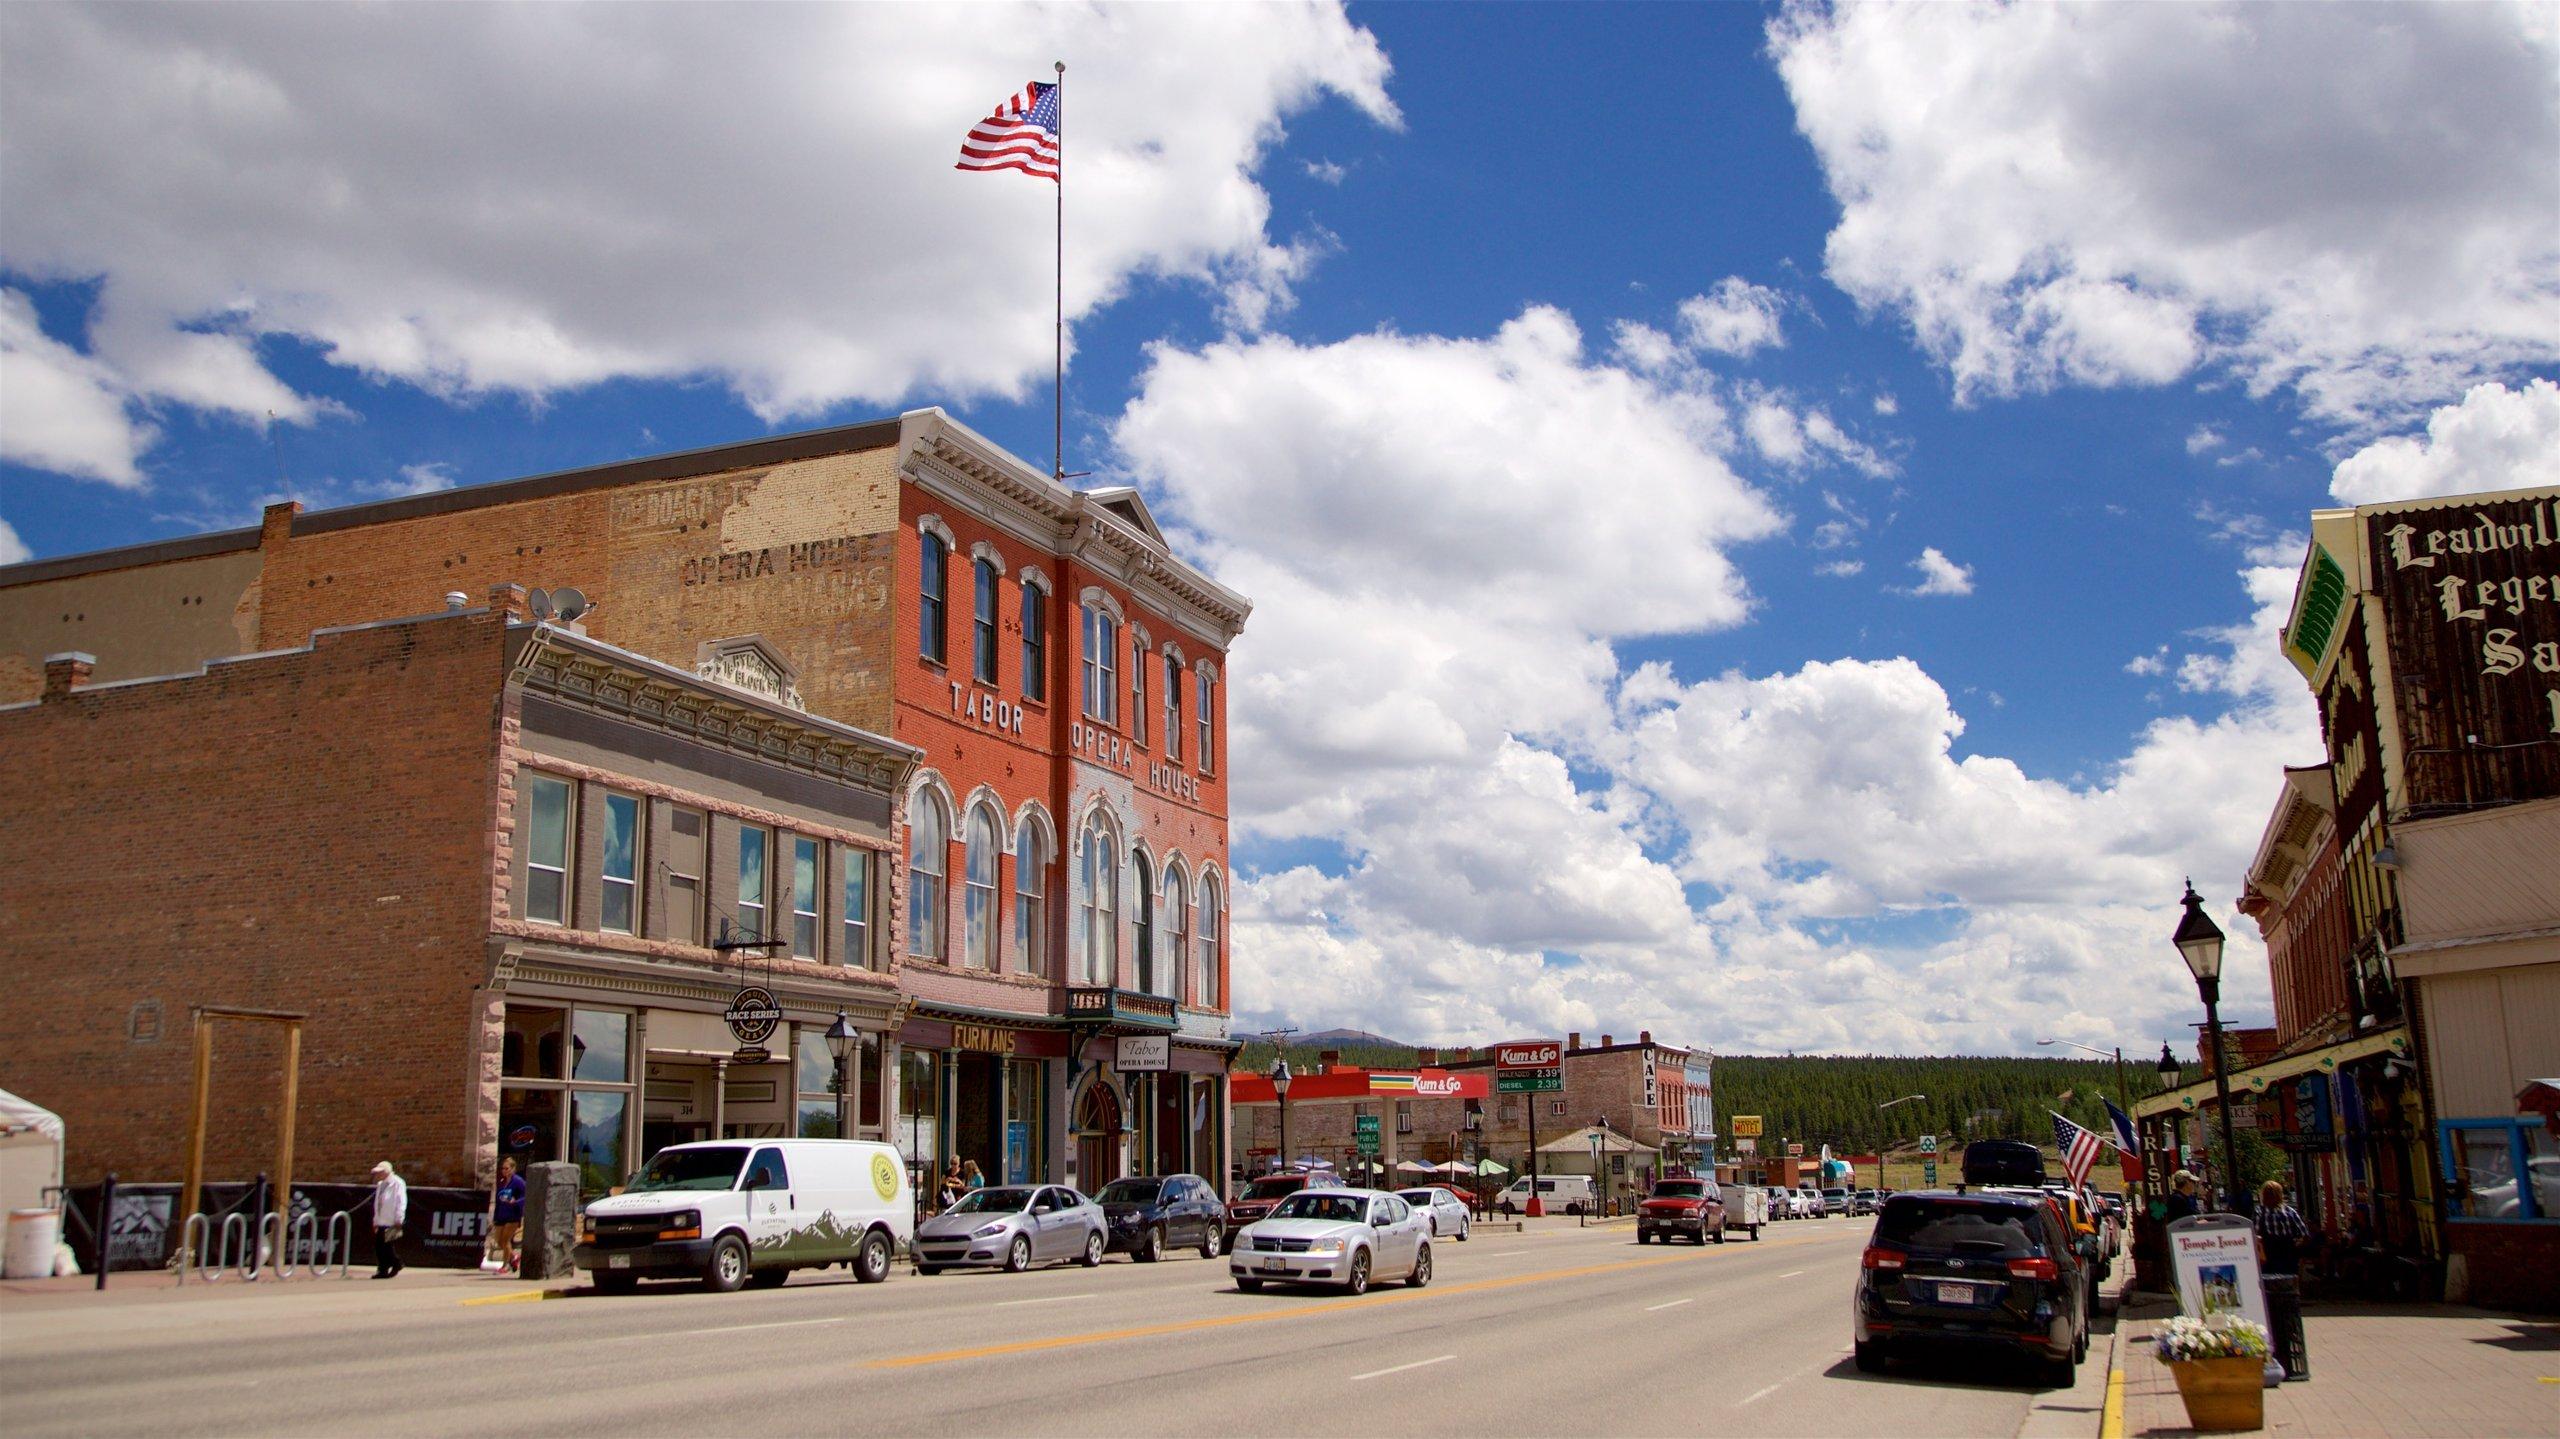 Leadville, Colorado, United States of America